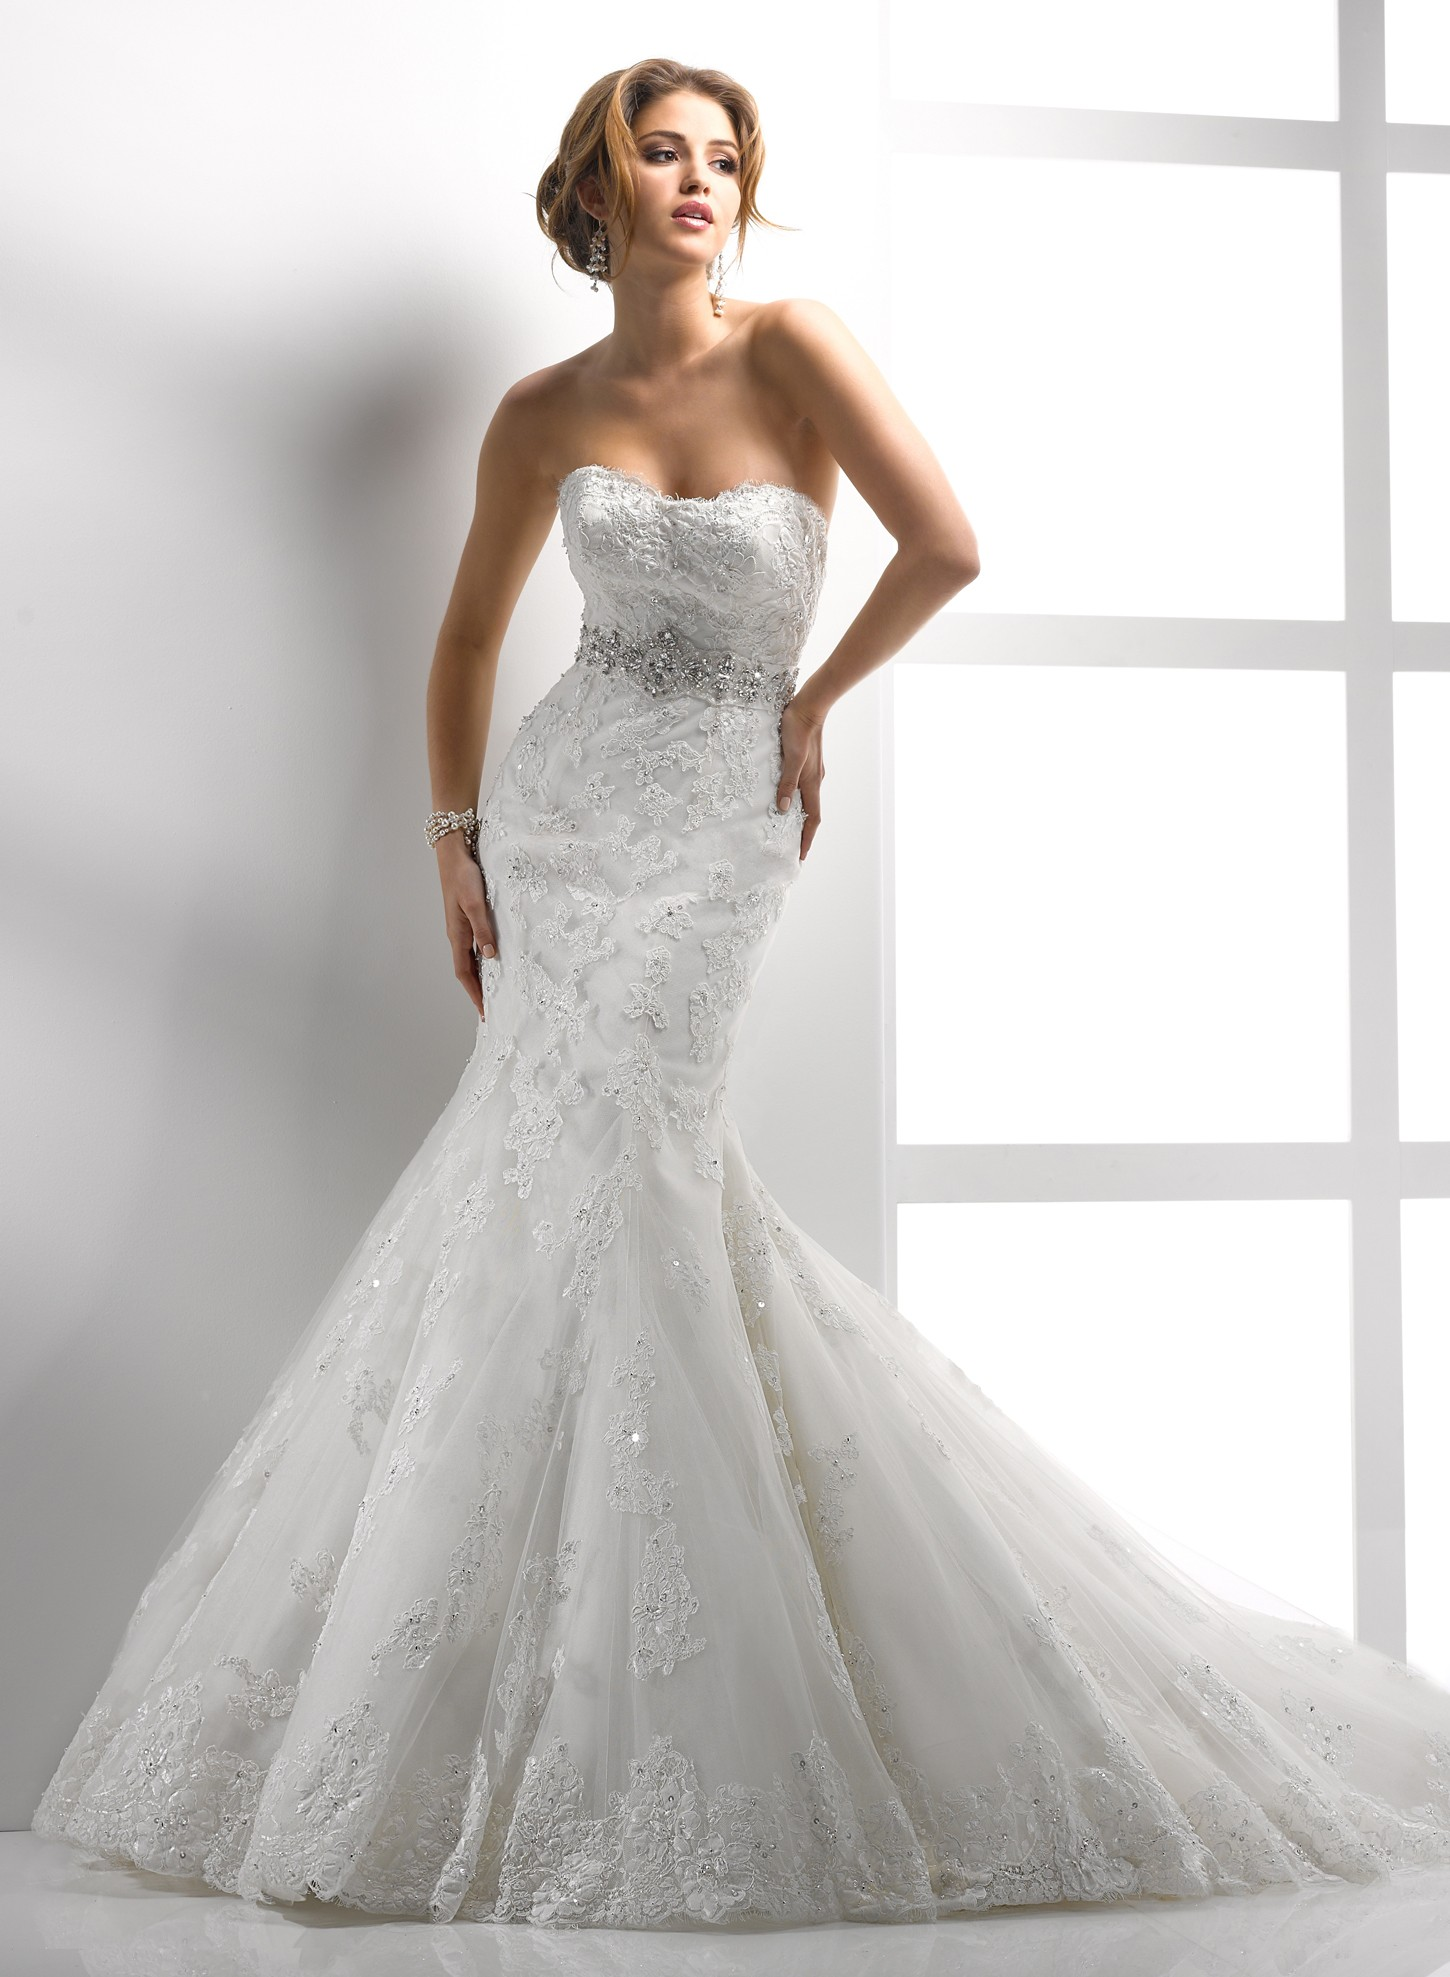 Lace Mermaid Wedding Dress  White Lace Mermaid Wedding Dress